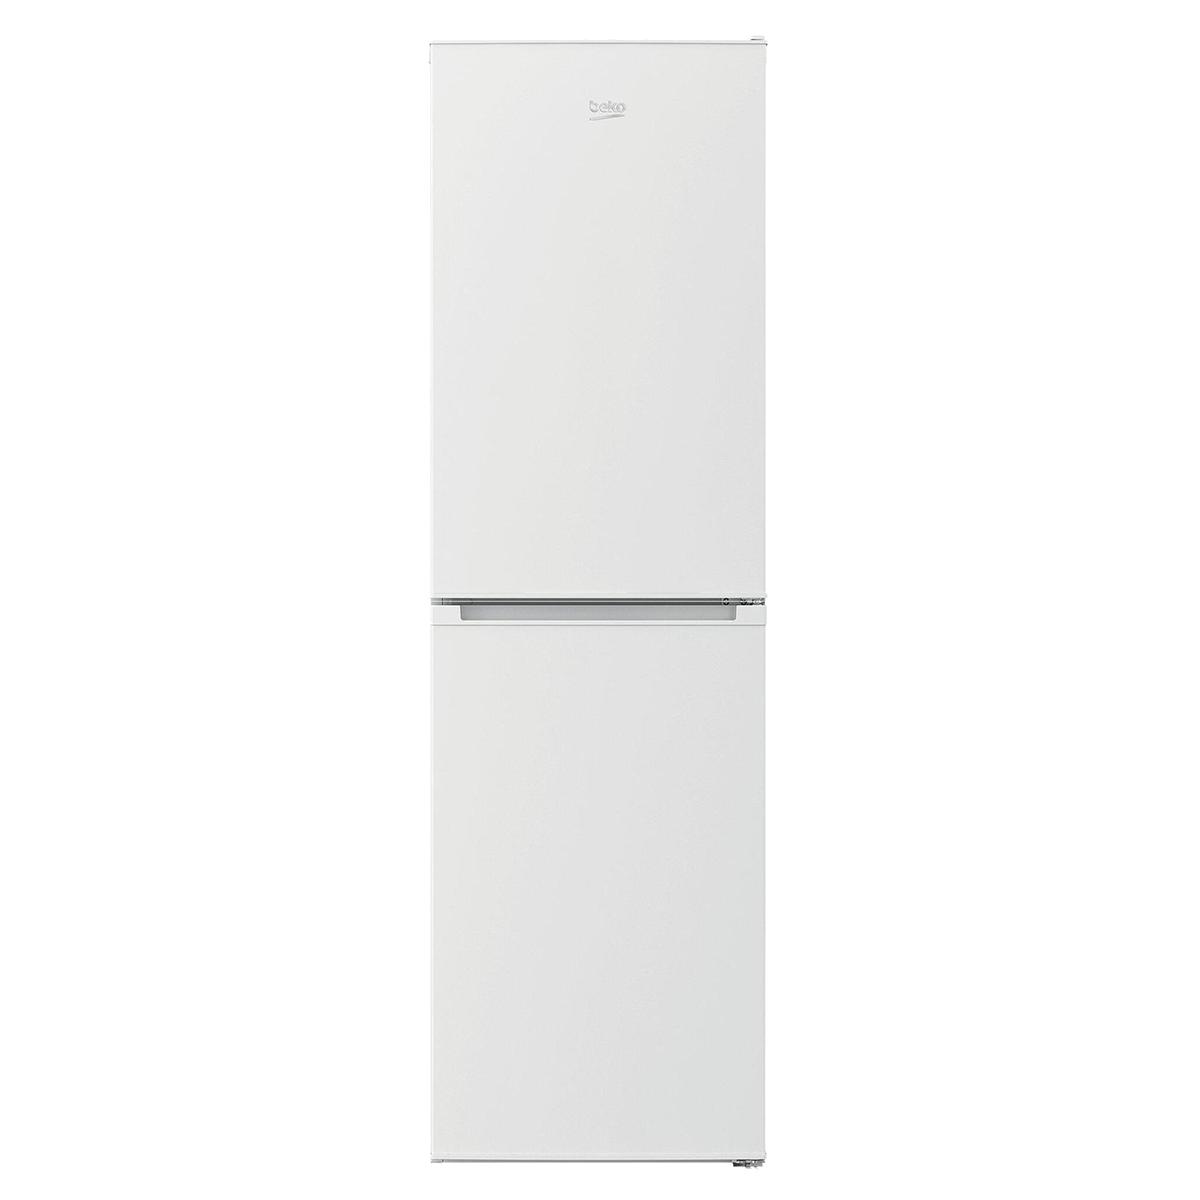 BEKO CCFM3582W, 54cm Frost Free Fridge Freezer - White - A+ Energy Rated